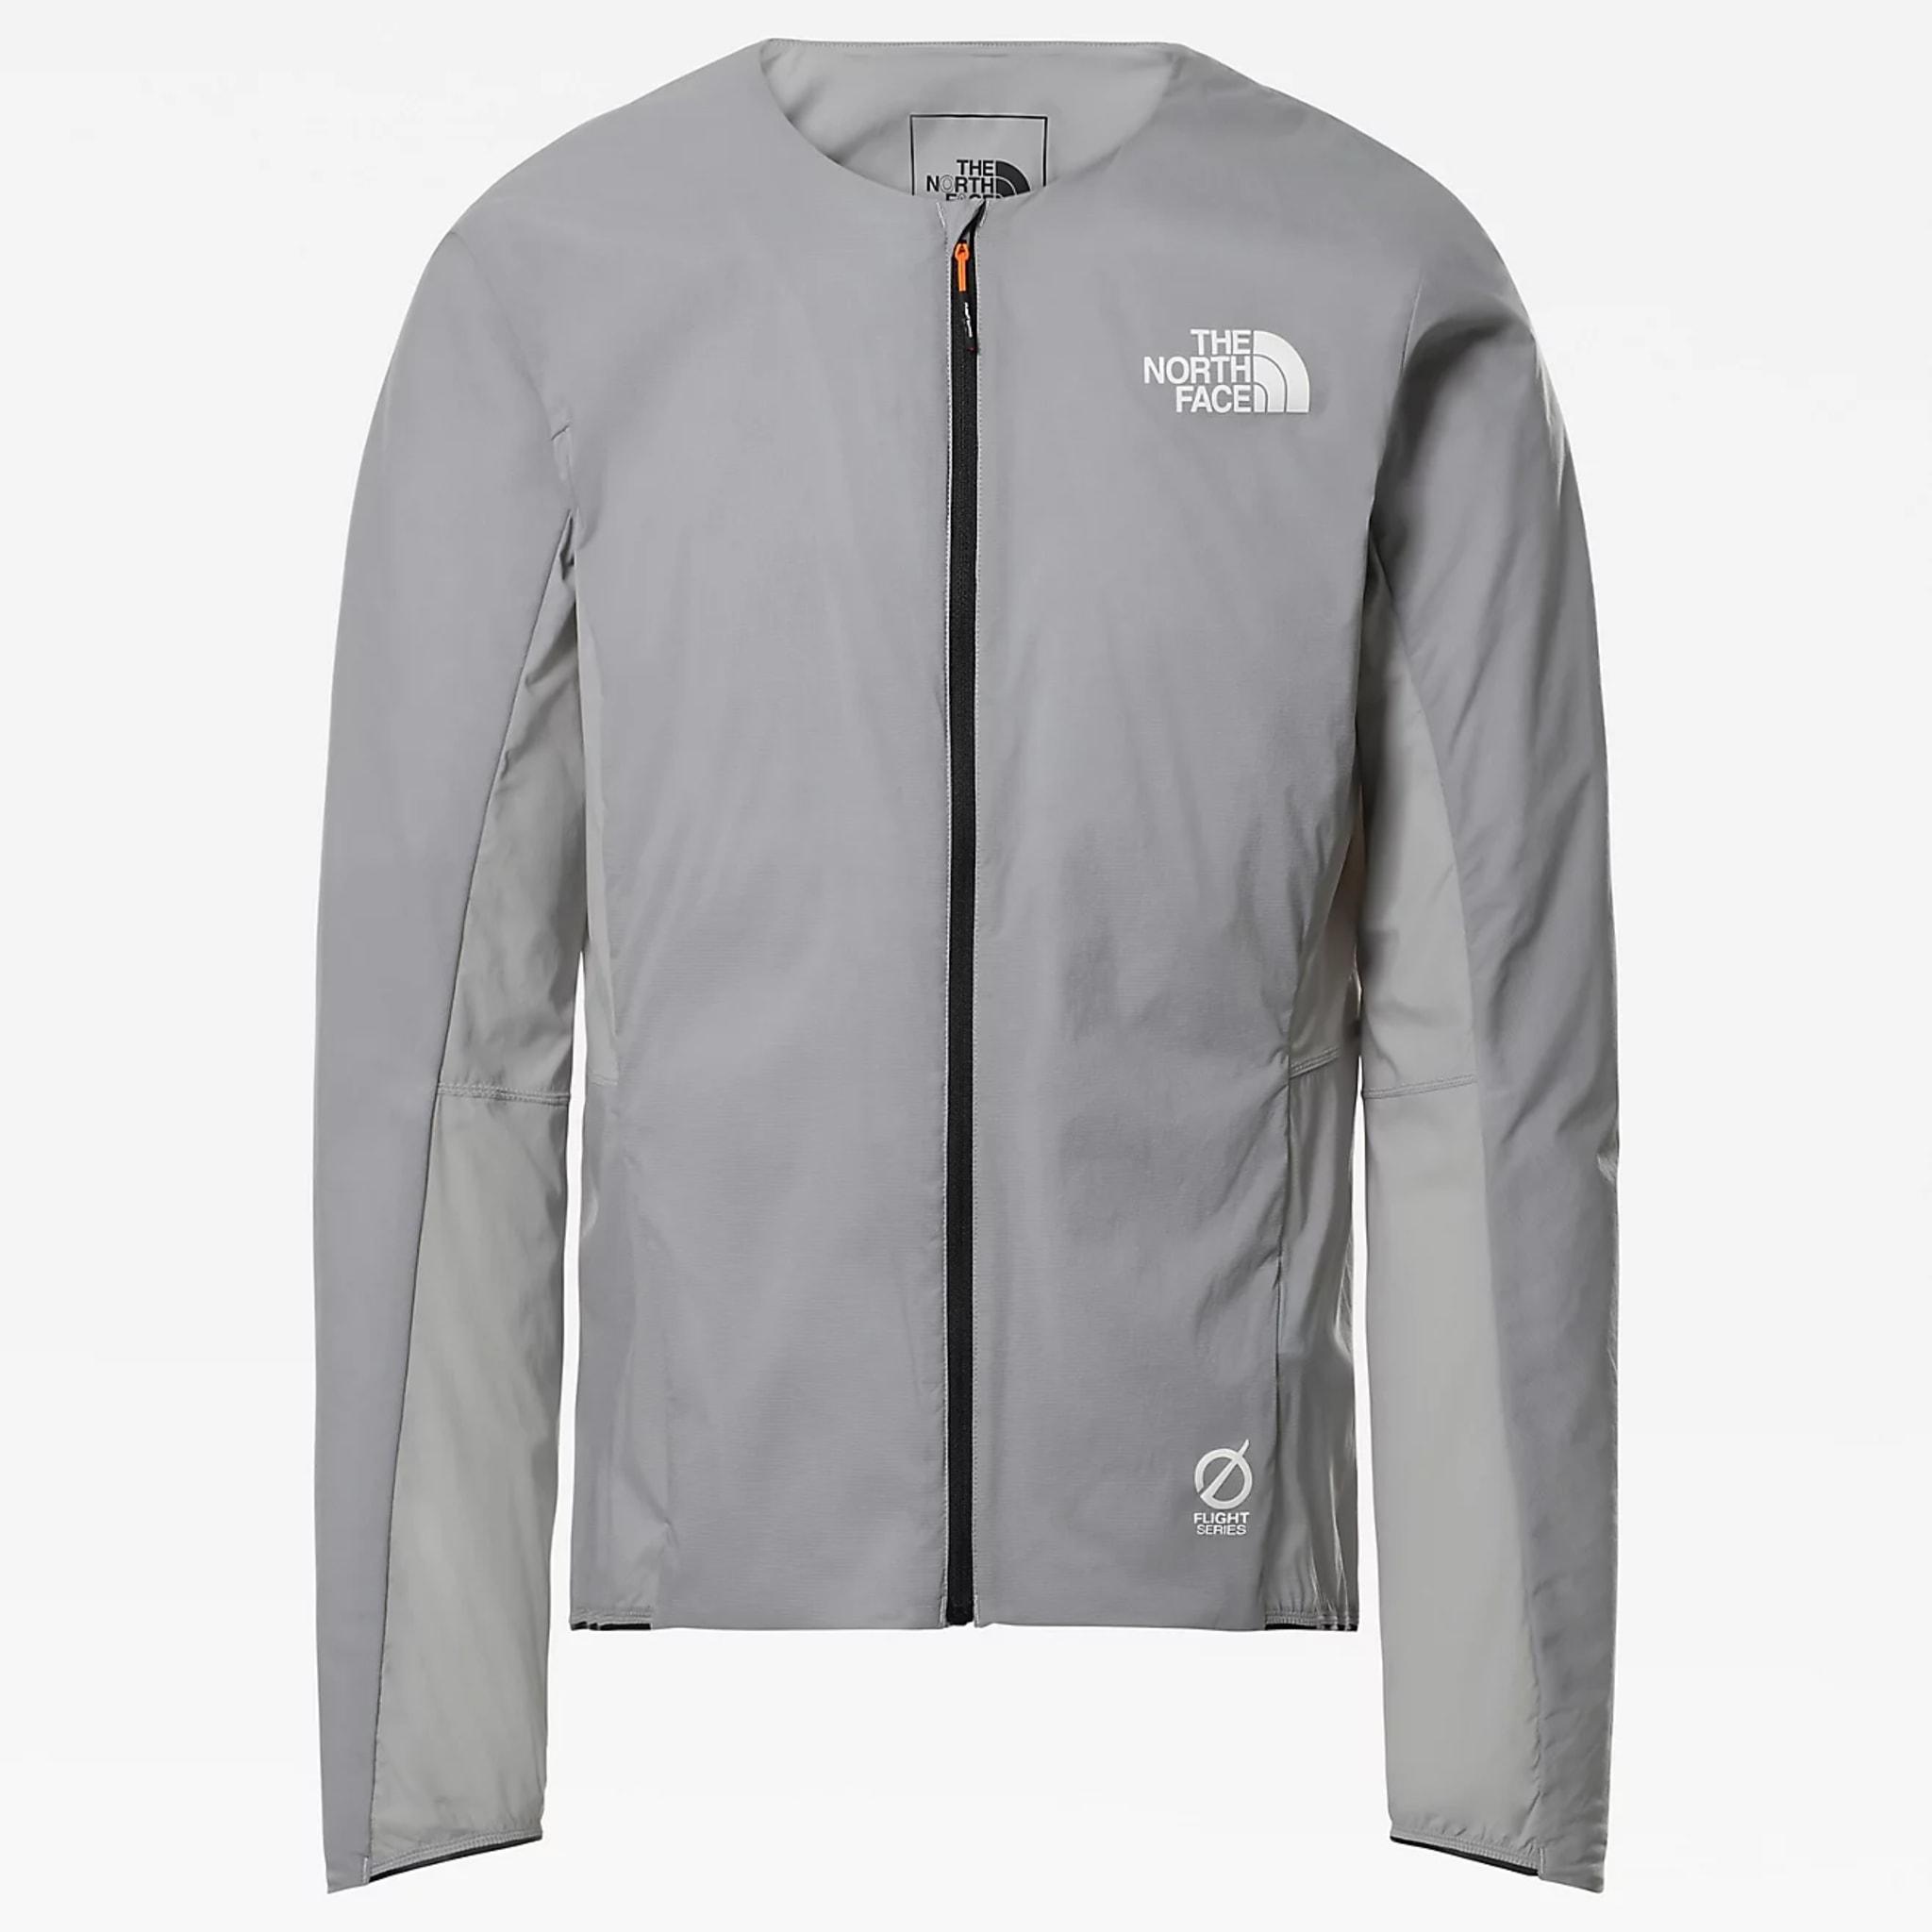 Den letteste jakken fra The North Face